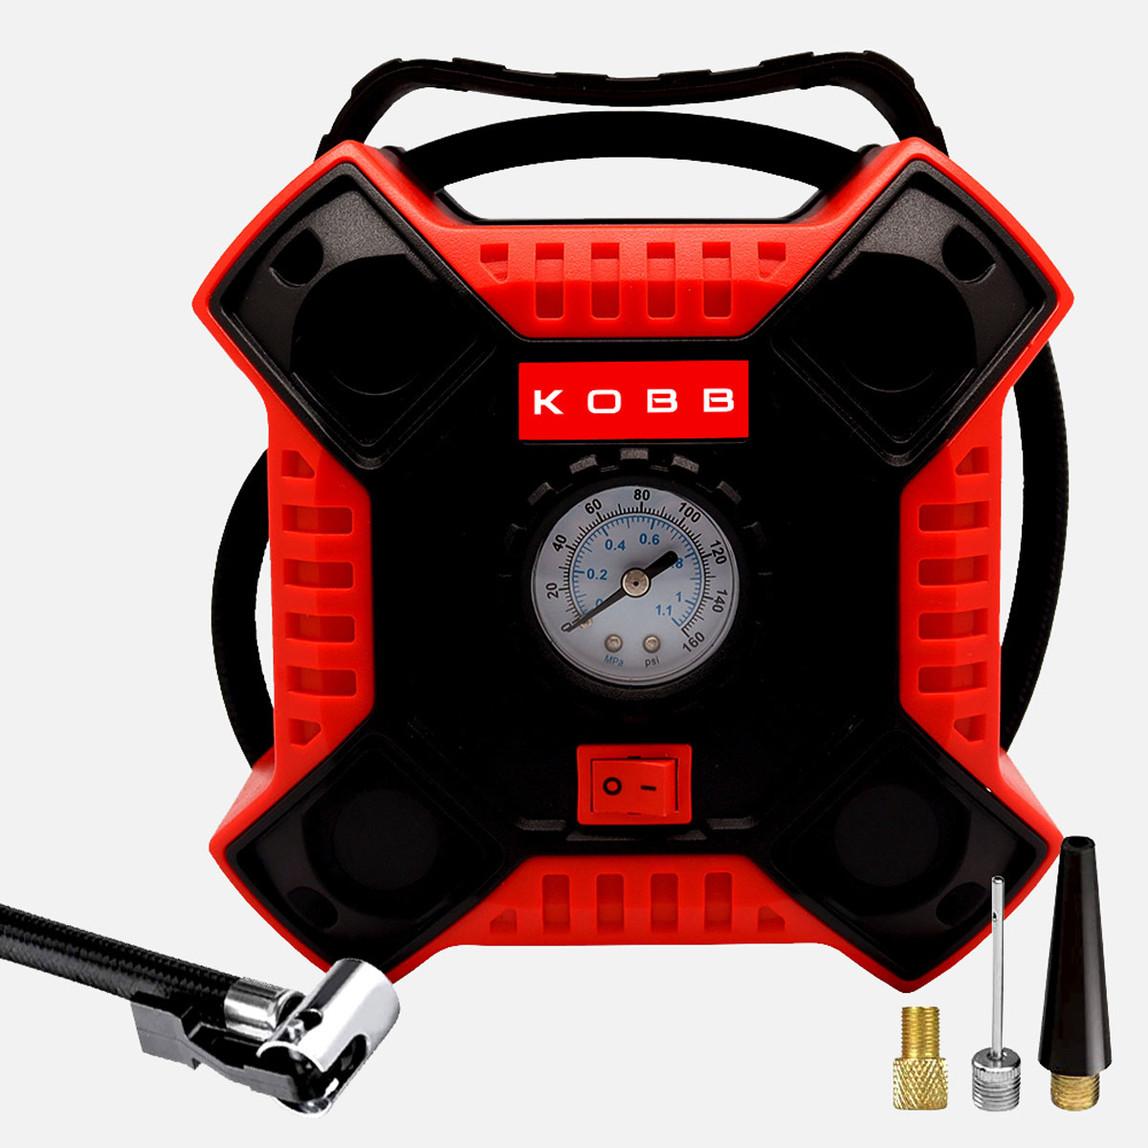 KOBB KB100 12Volt 160 PSI Analog Göstergeli Hava Pompası